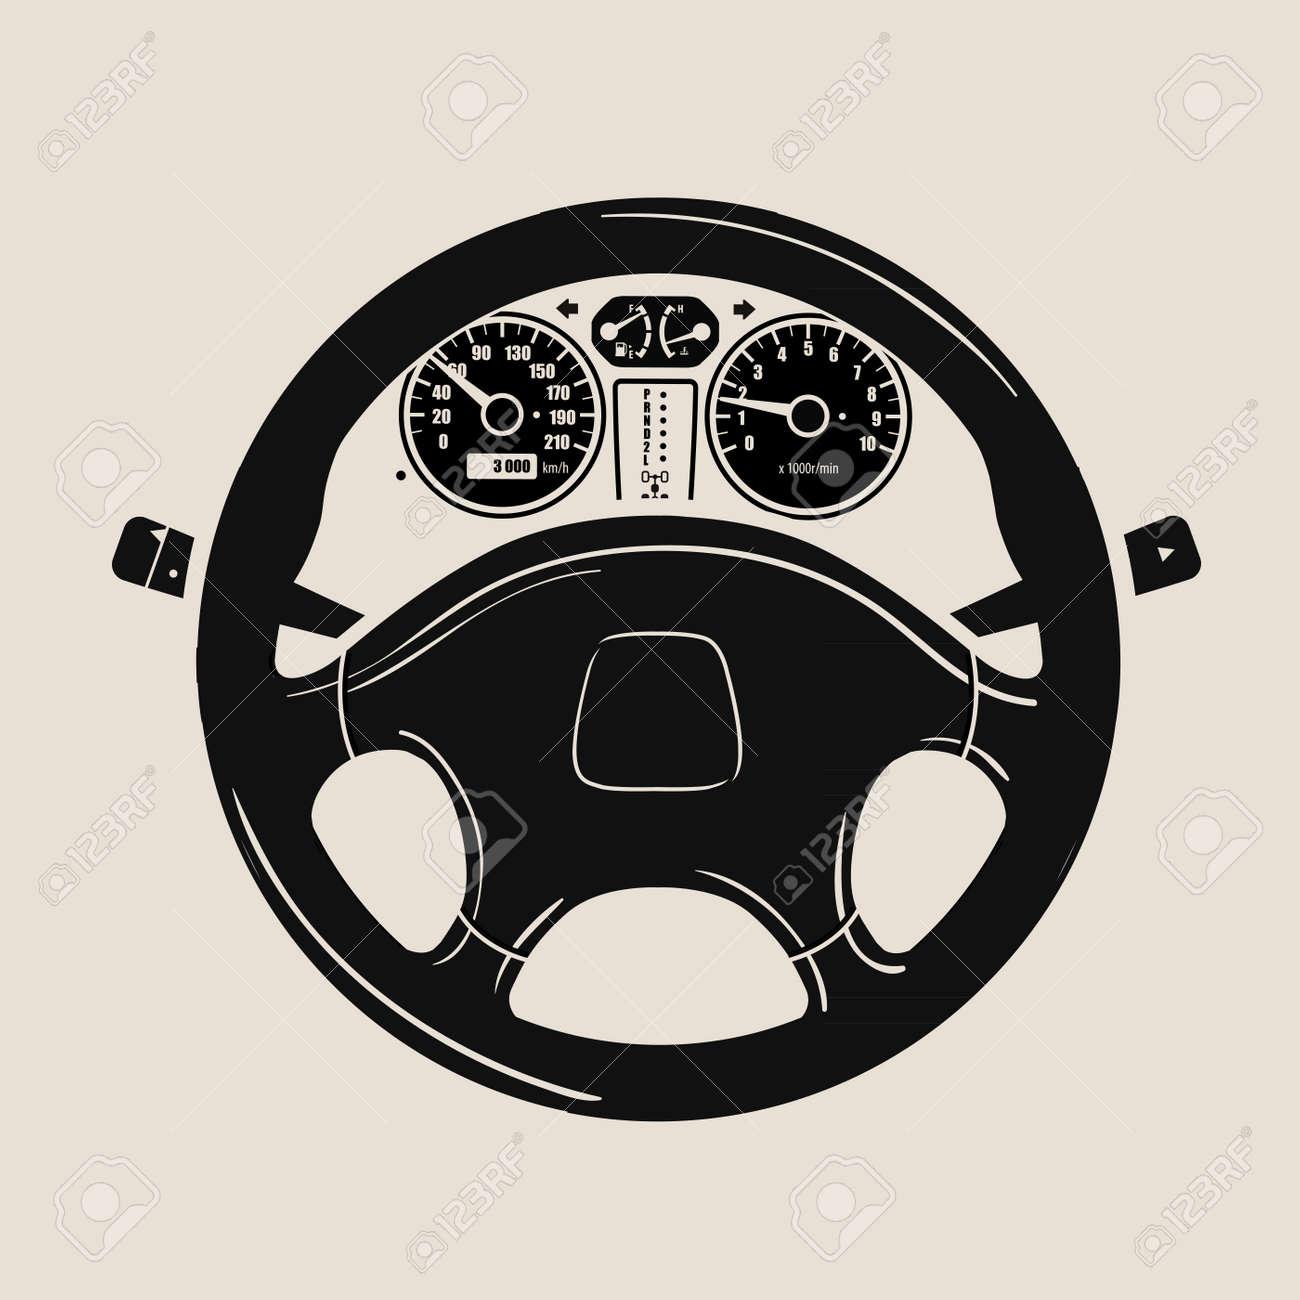 black car wheel and speedometer. vector illustration - 50079286